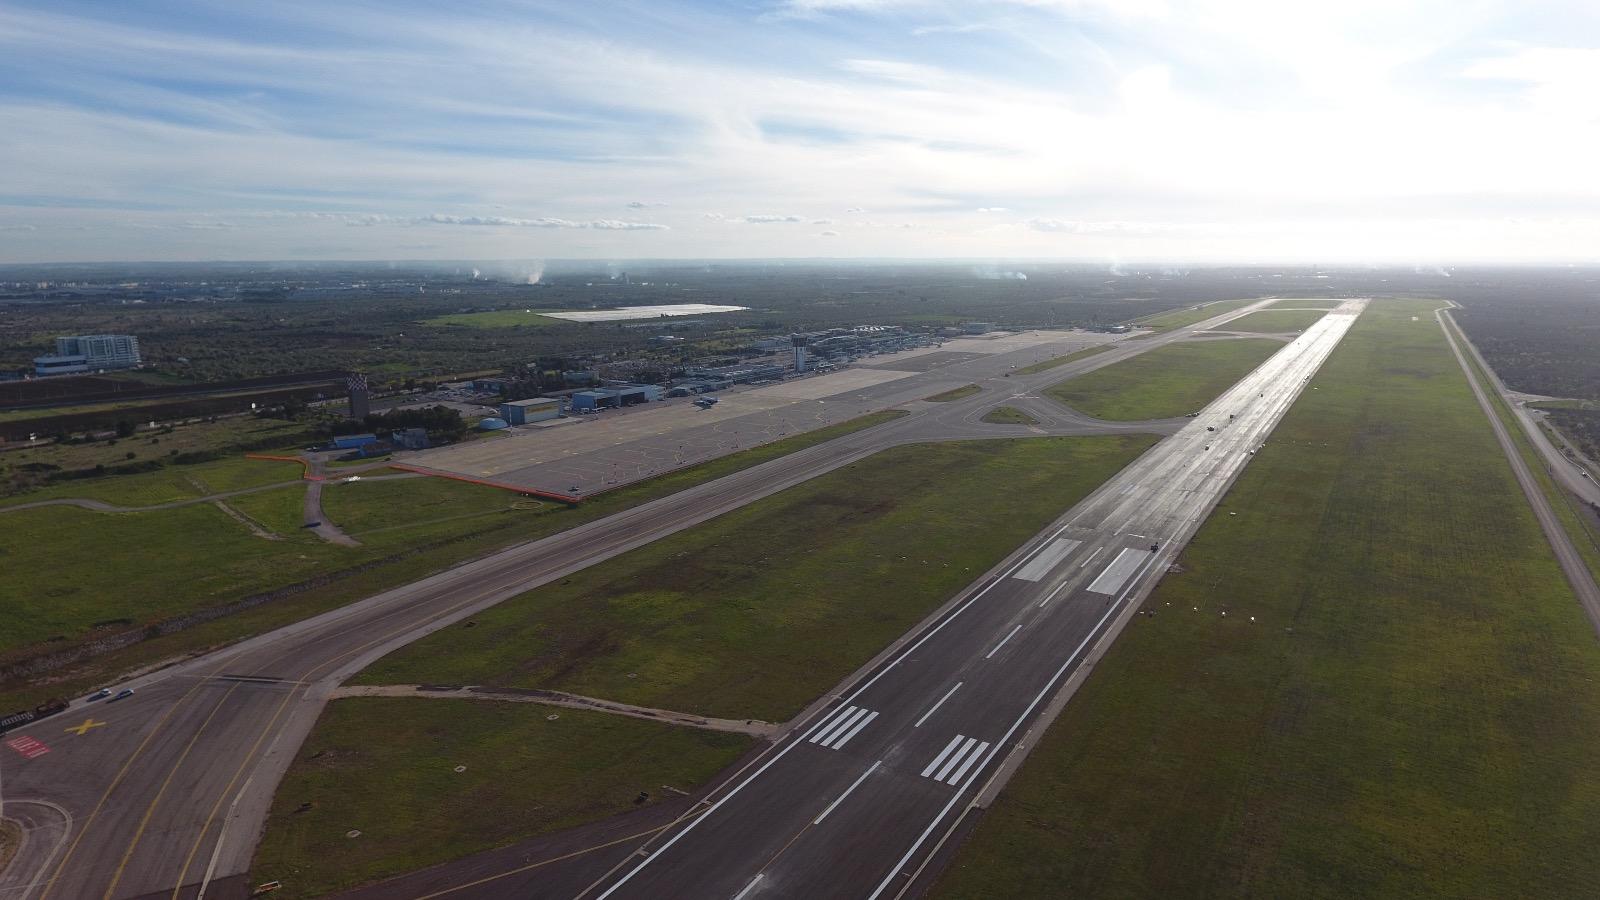 Aeroporto Bari : Workshop all aeroporto di bari u italiavola